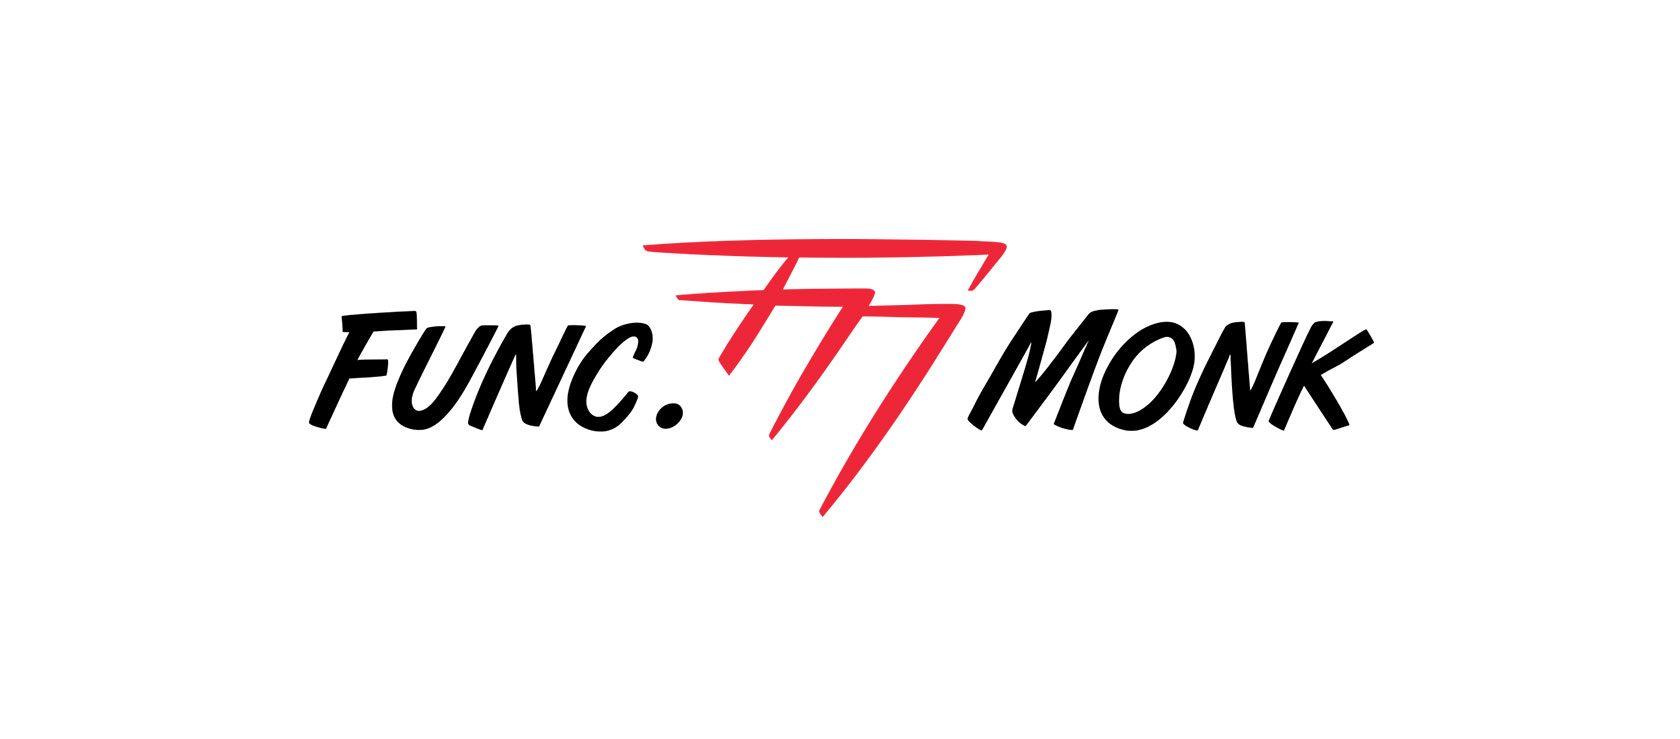 Func Monk Logo Identity Design by Furia